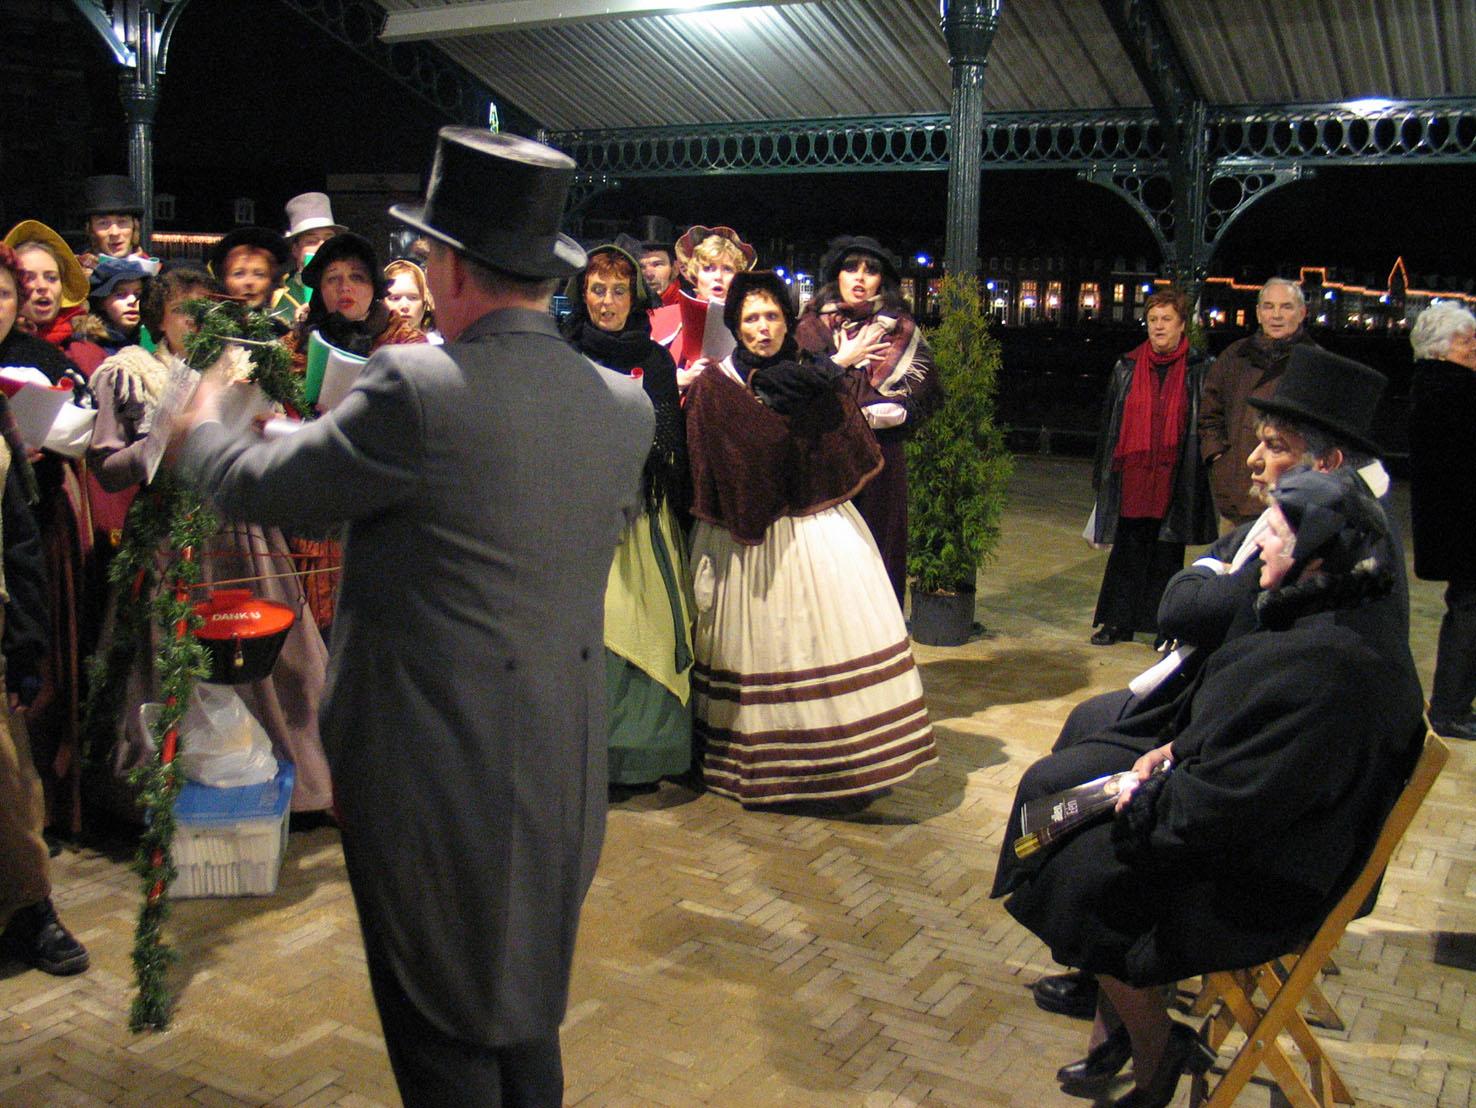 158 - Kerstmarkt Helmond 2003.jpg